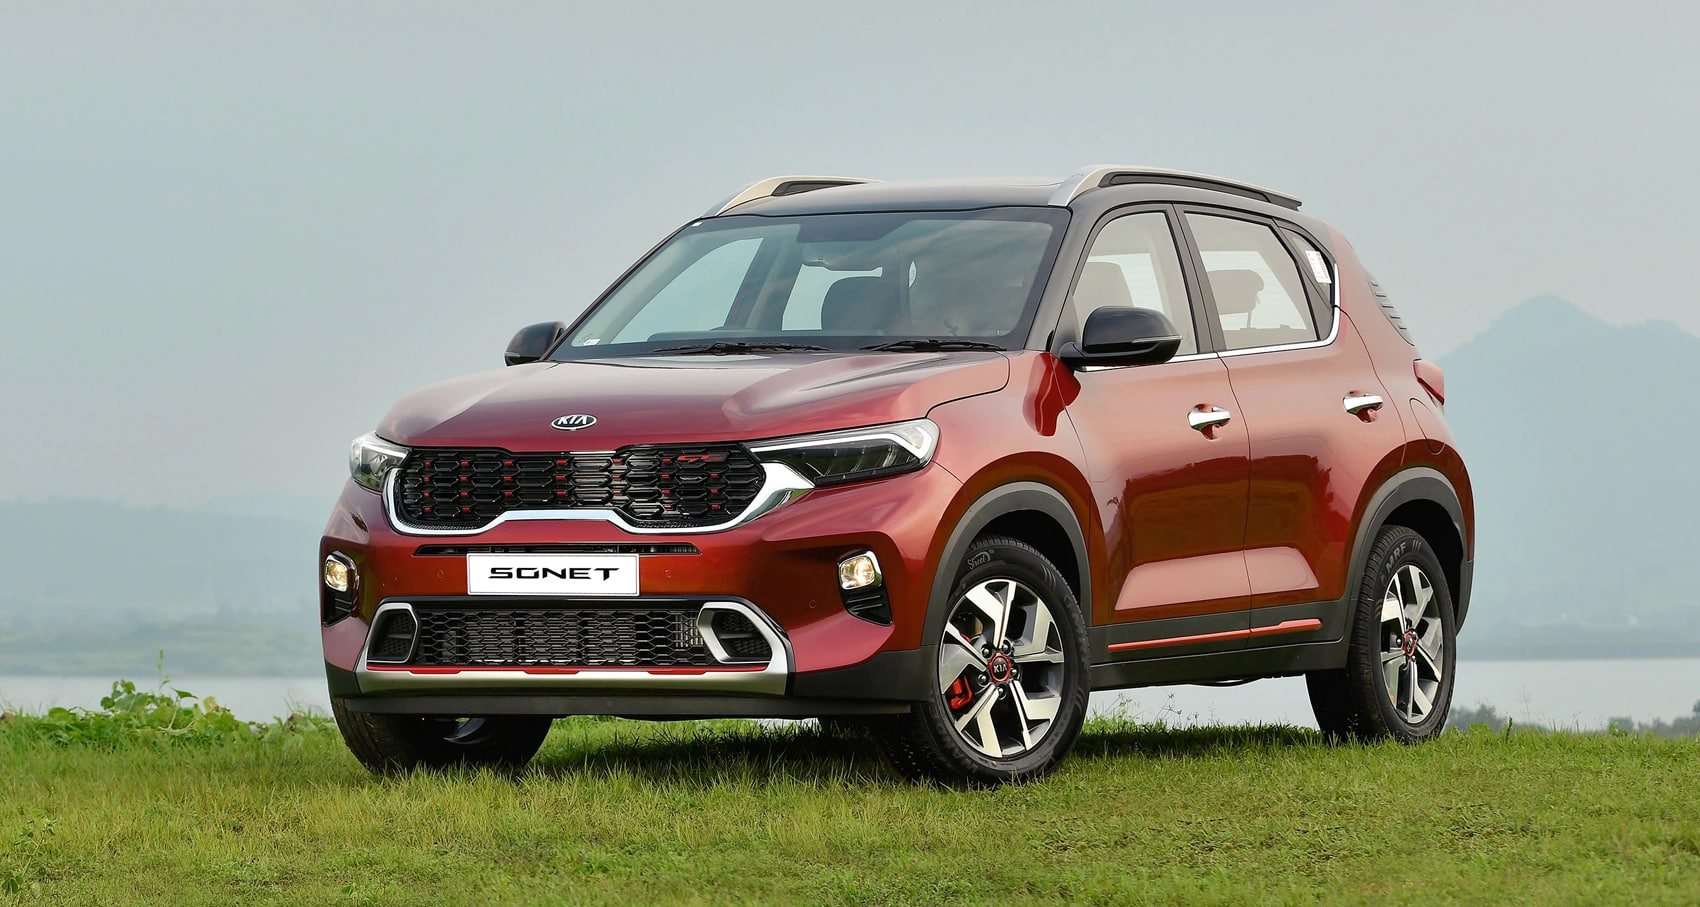 Maruti-Suzuki keeps 50% of the market; MG Shines